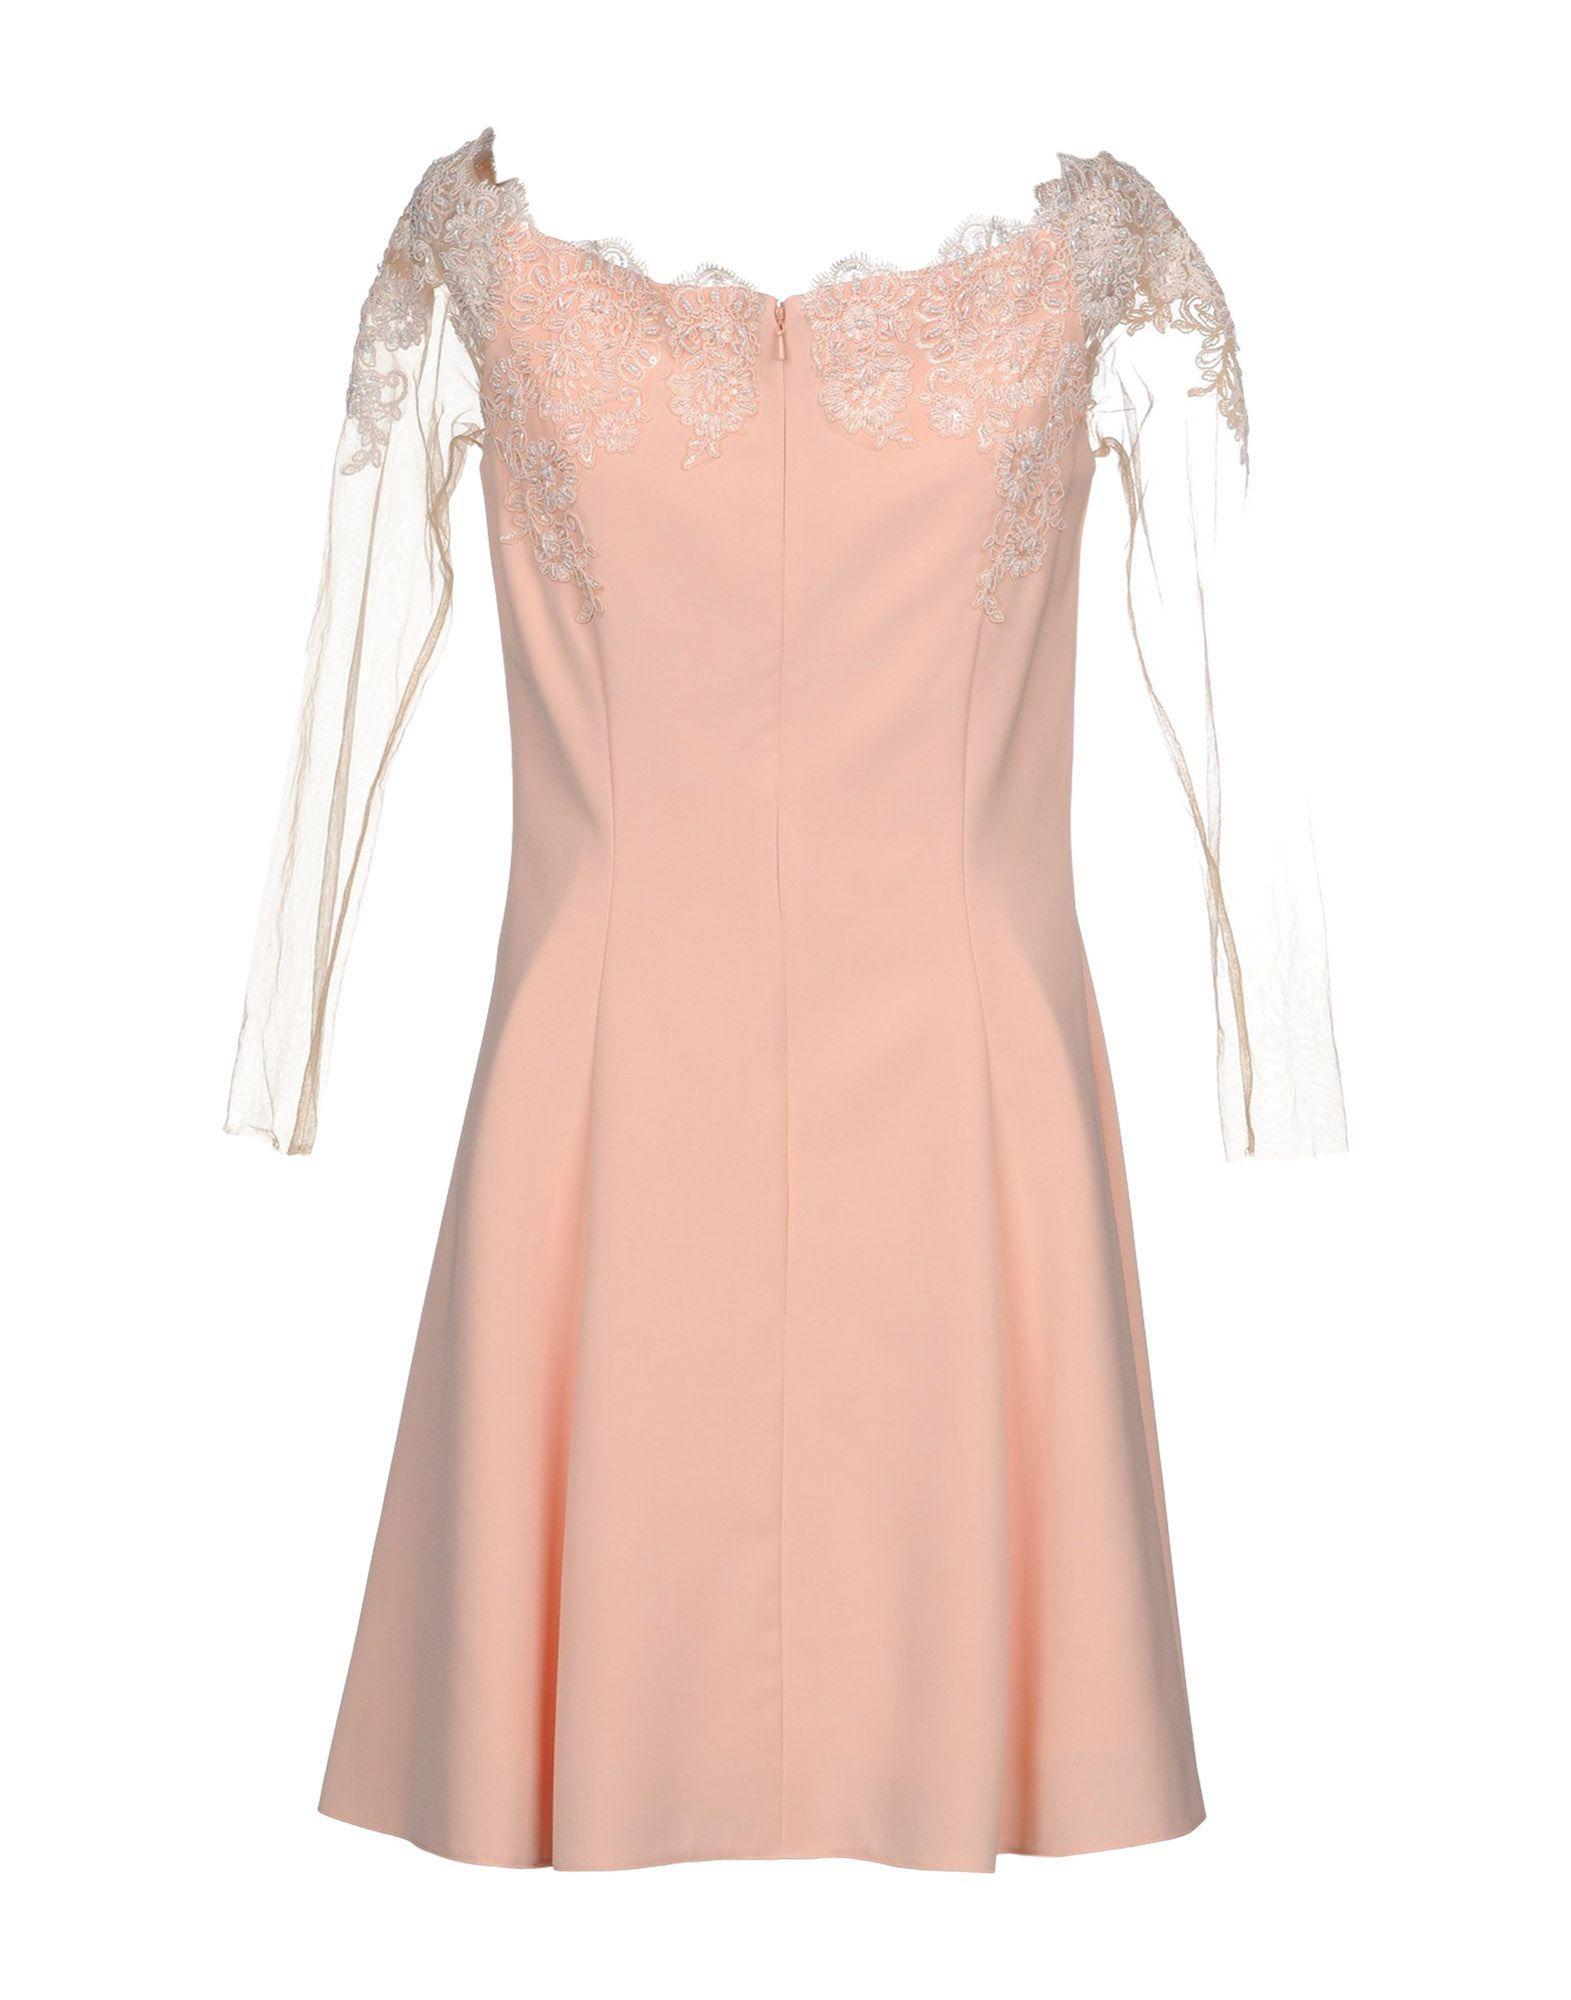 Forever Unique Salmon Pink Lace Dress